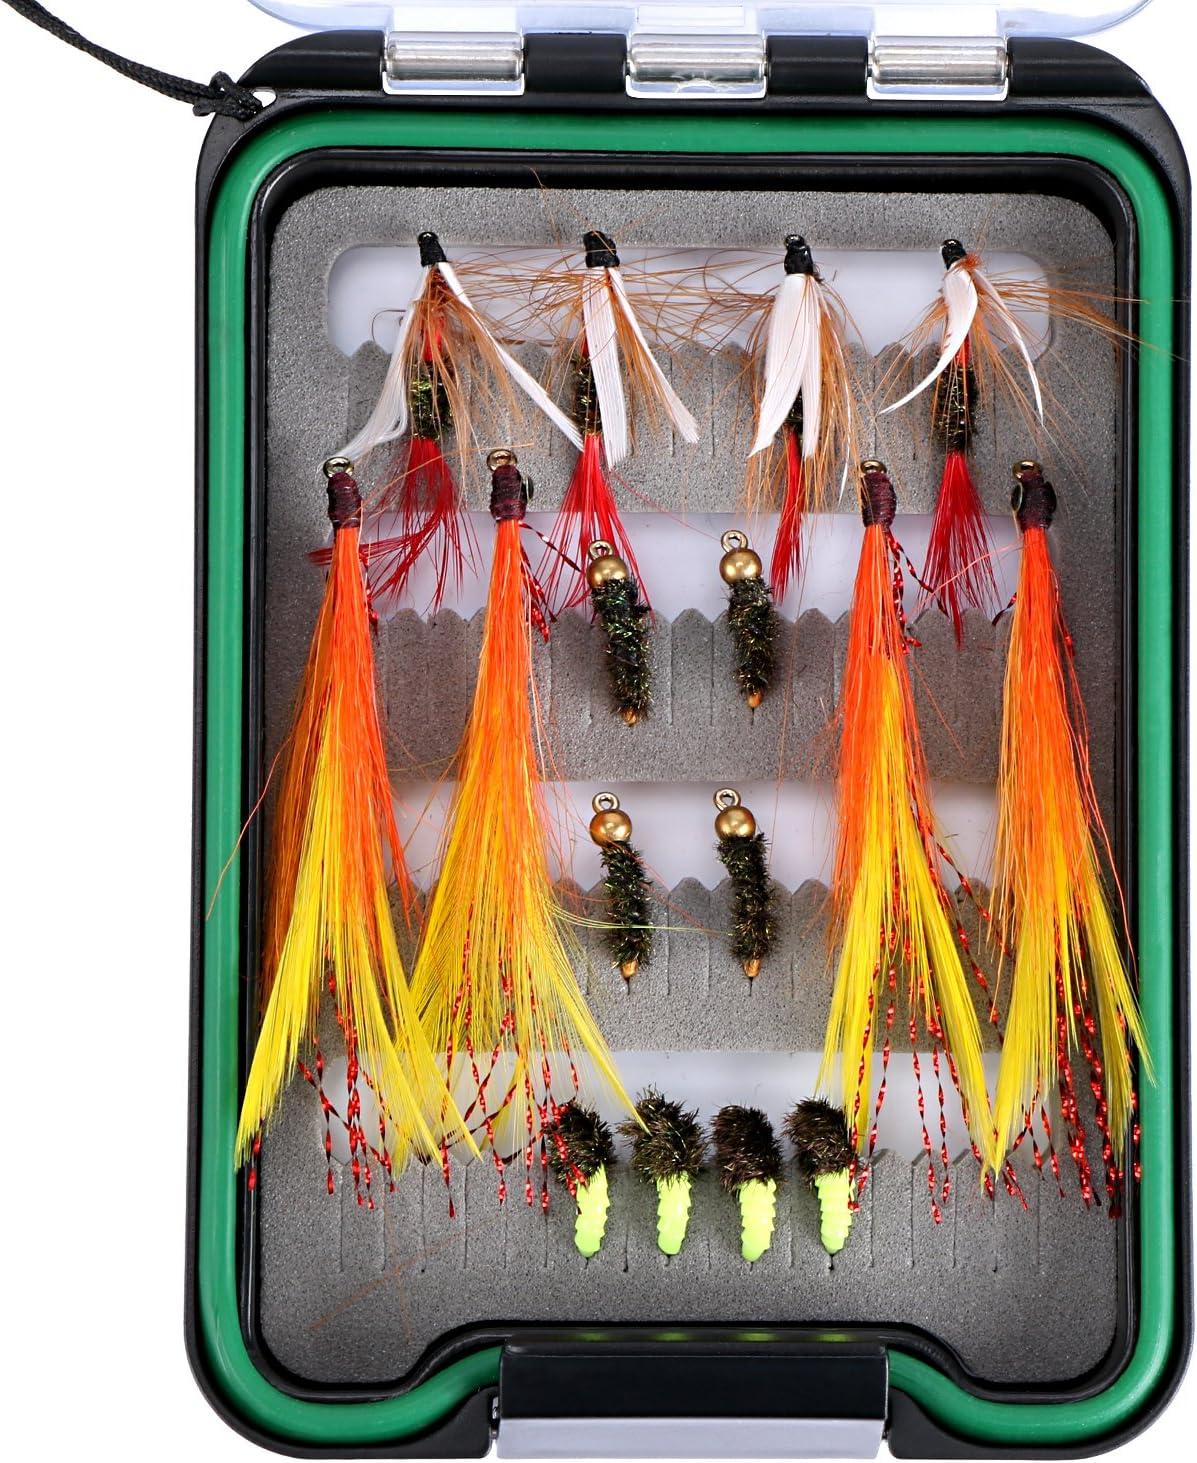 Portable Waterproof Fly Fishing Lure Bait Trout Flies Storage Box Hook Case A5R8